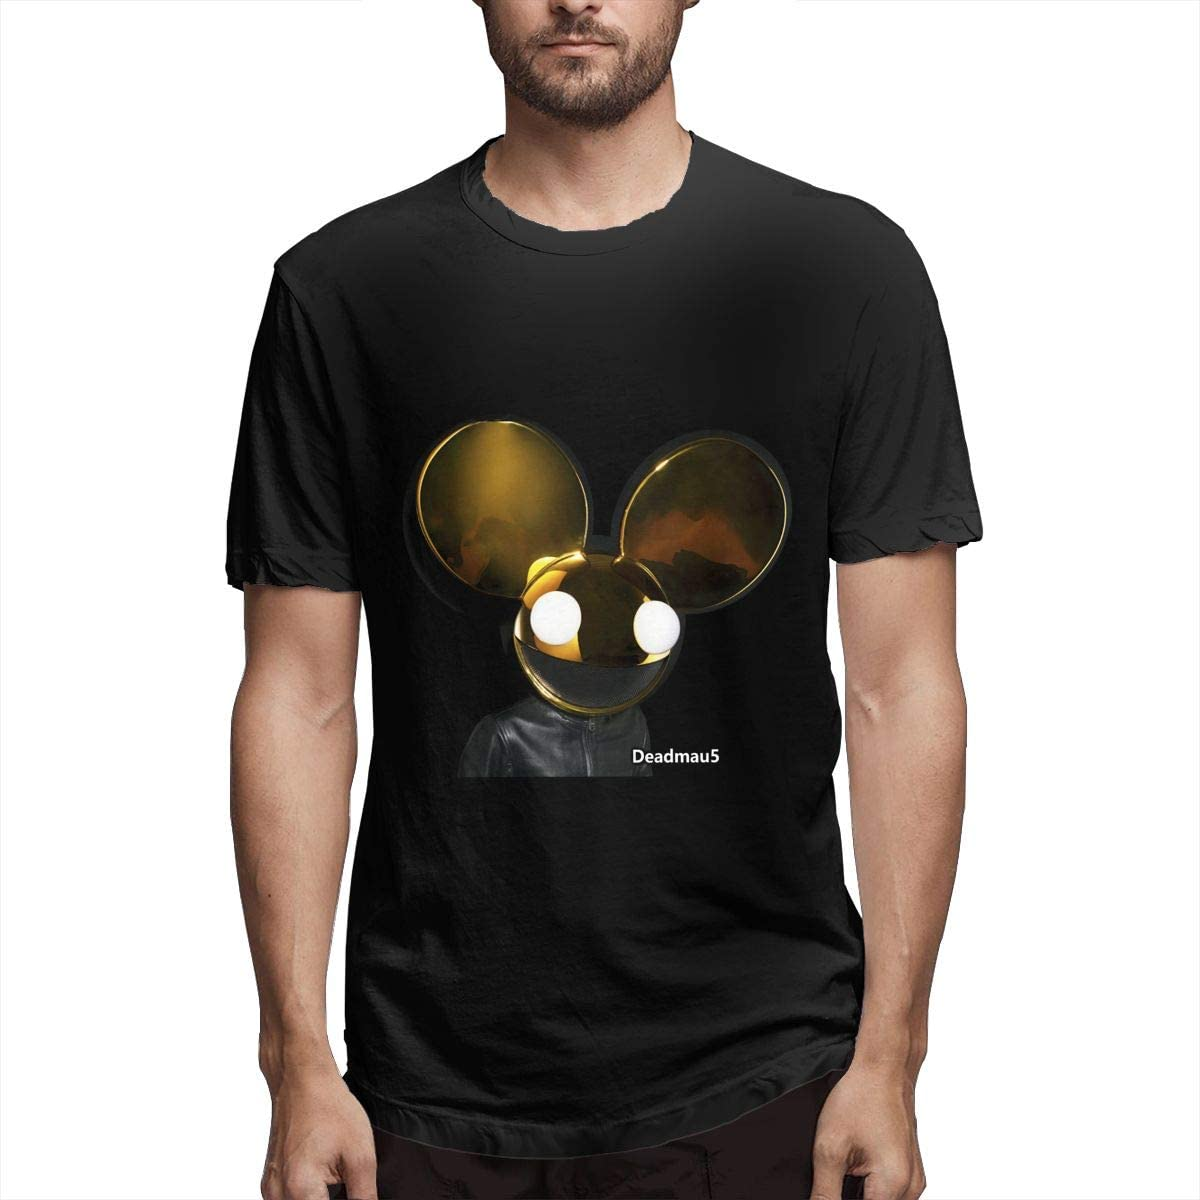 HualYwsl Deadmau5 Men's Short Sleeve T-Shirt Clothing Classic Crew Neck Tee